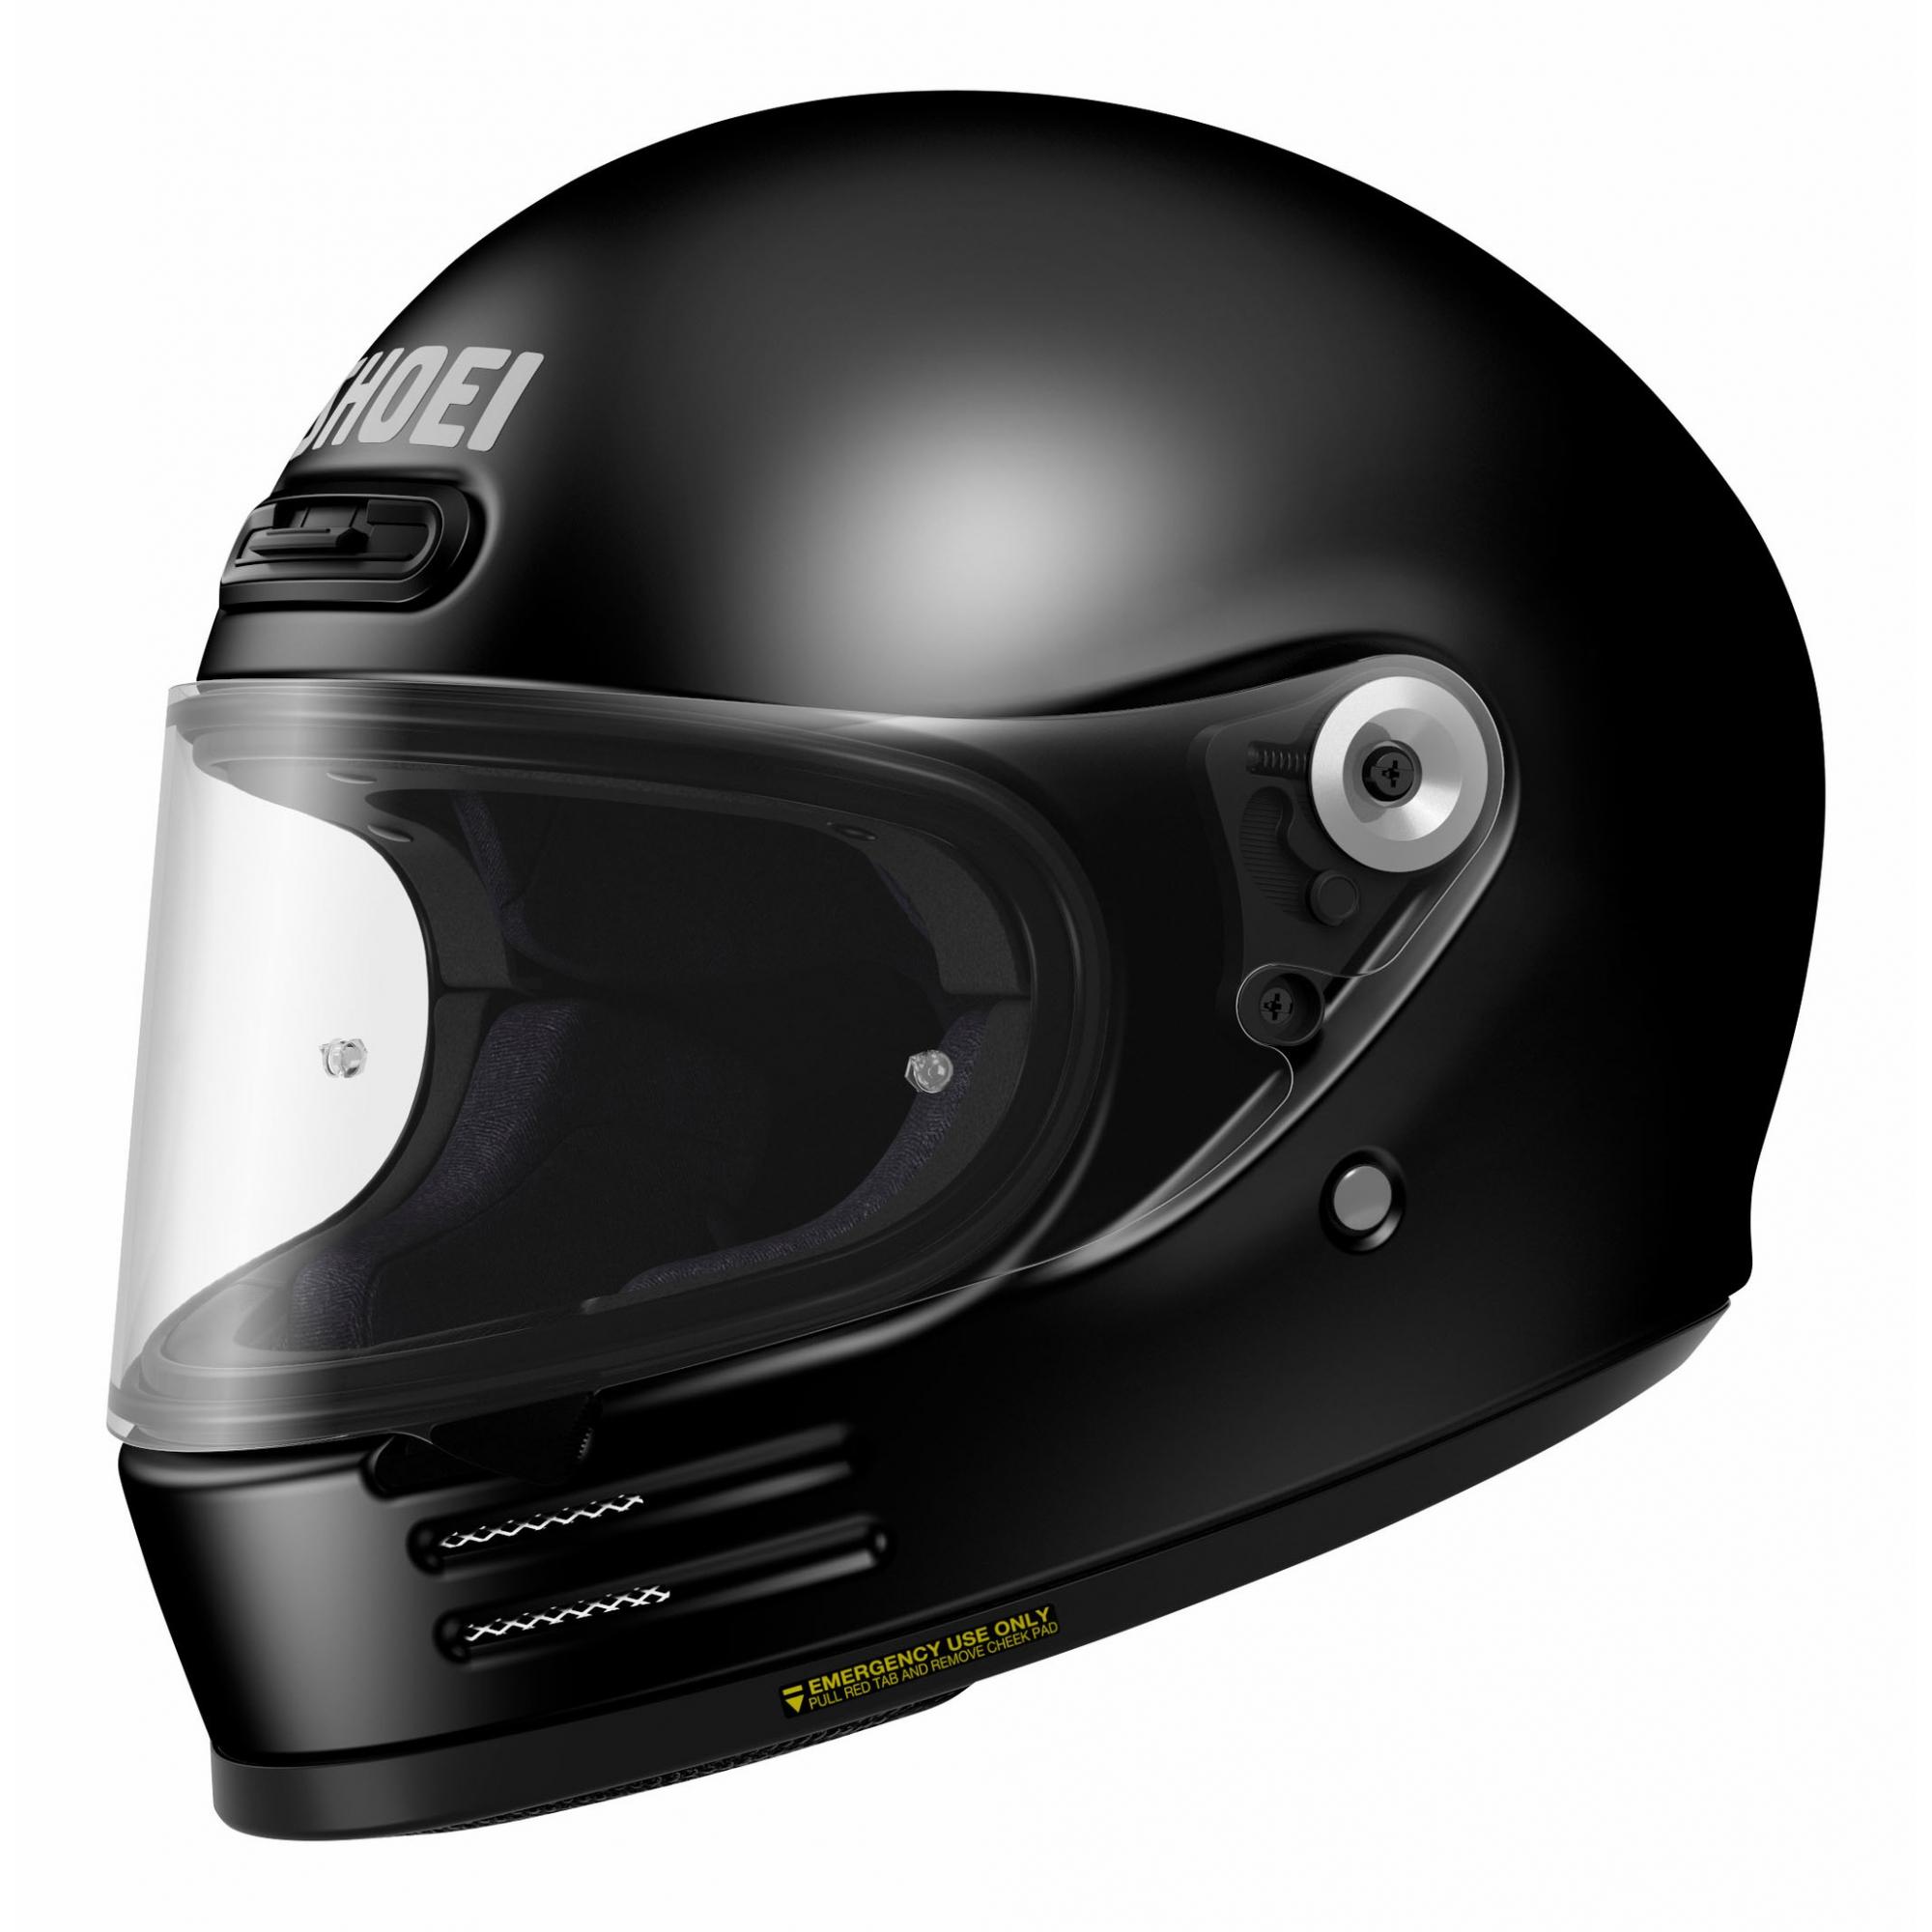 CAPACETE SHOEI GLAMSTER - Preto/Fosco - LANÇAMENTO  - Nova Centro Boutique Roupas para Motociclistas